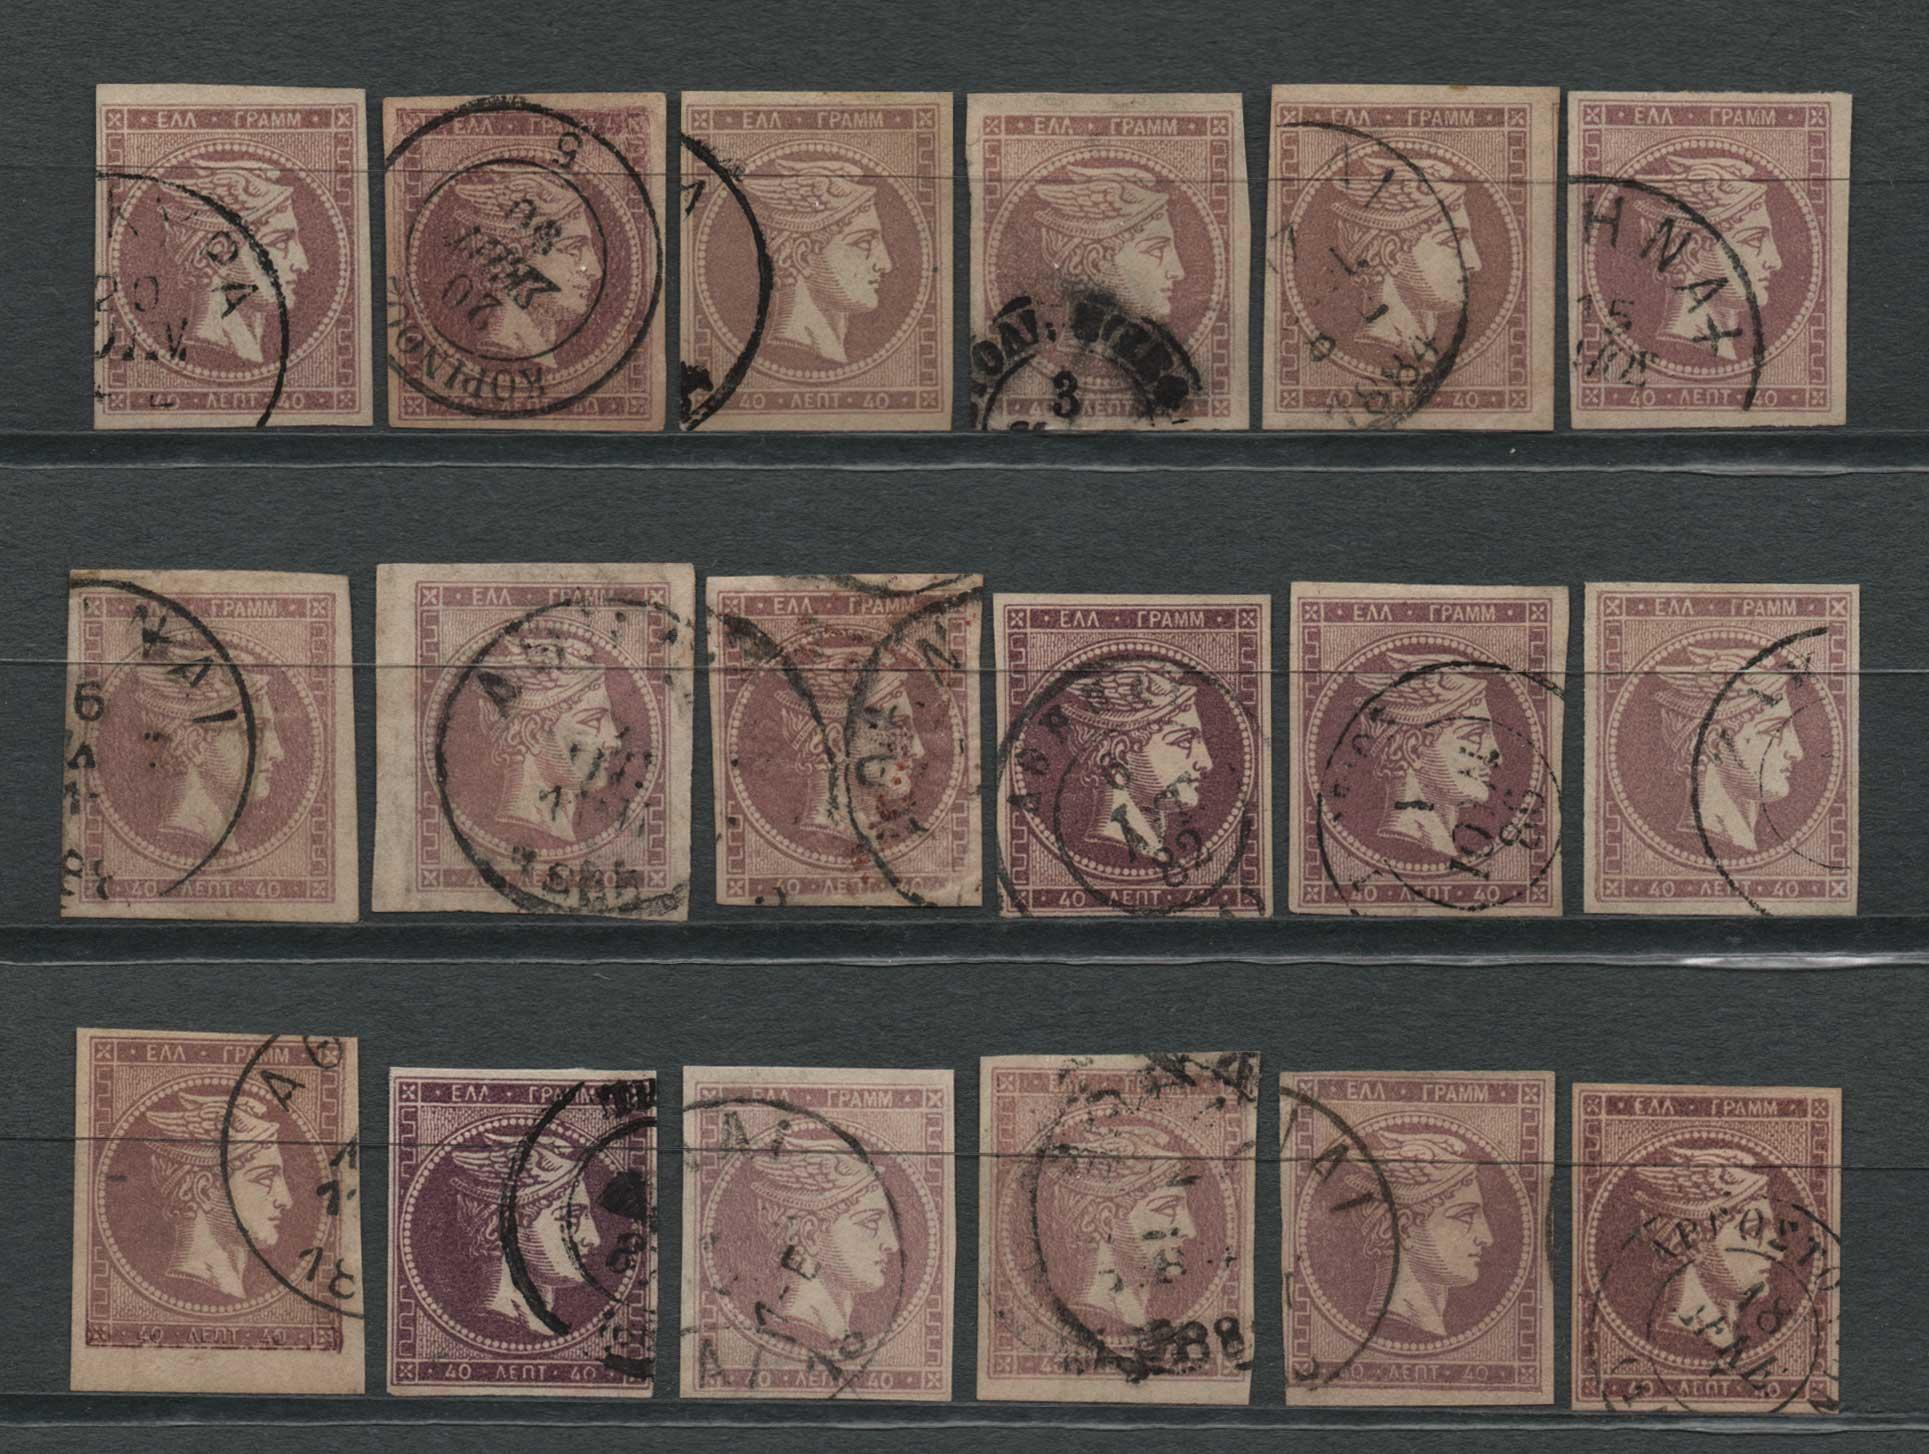 Lot 13 - -  LARGE HERMES HEAD large hermes head -  Athens Auctions Public Auction 67 General Stamp Sale